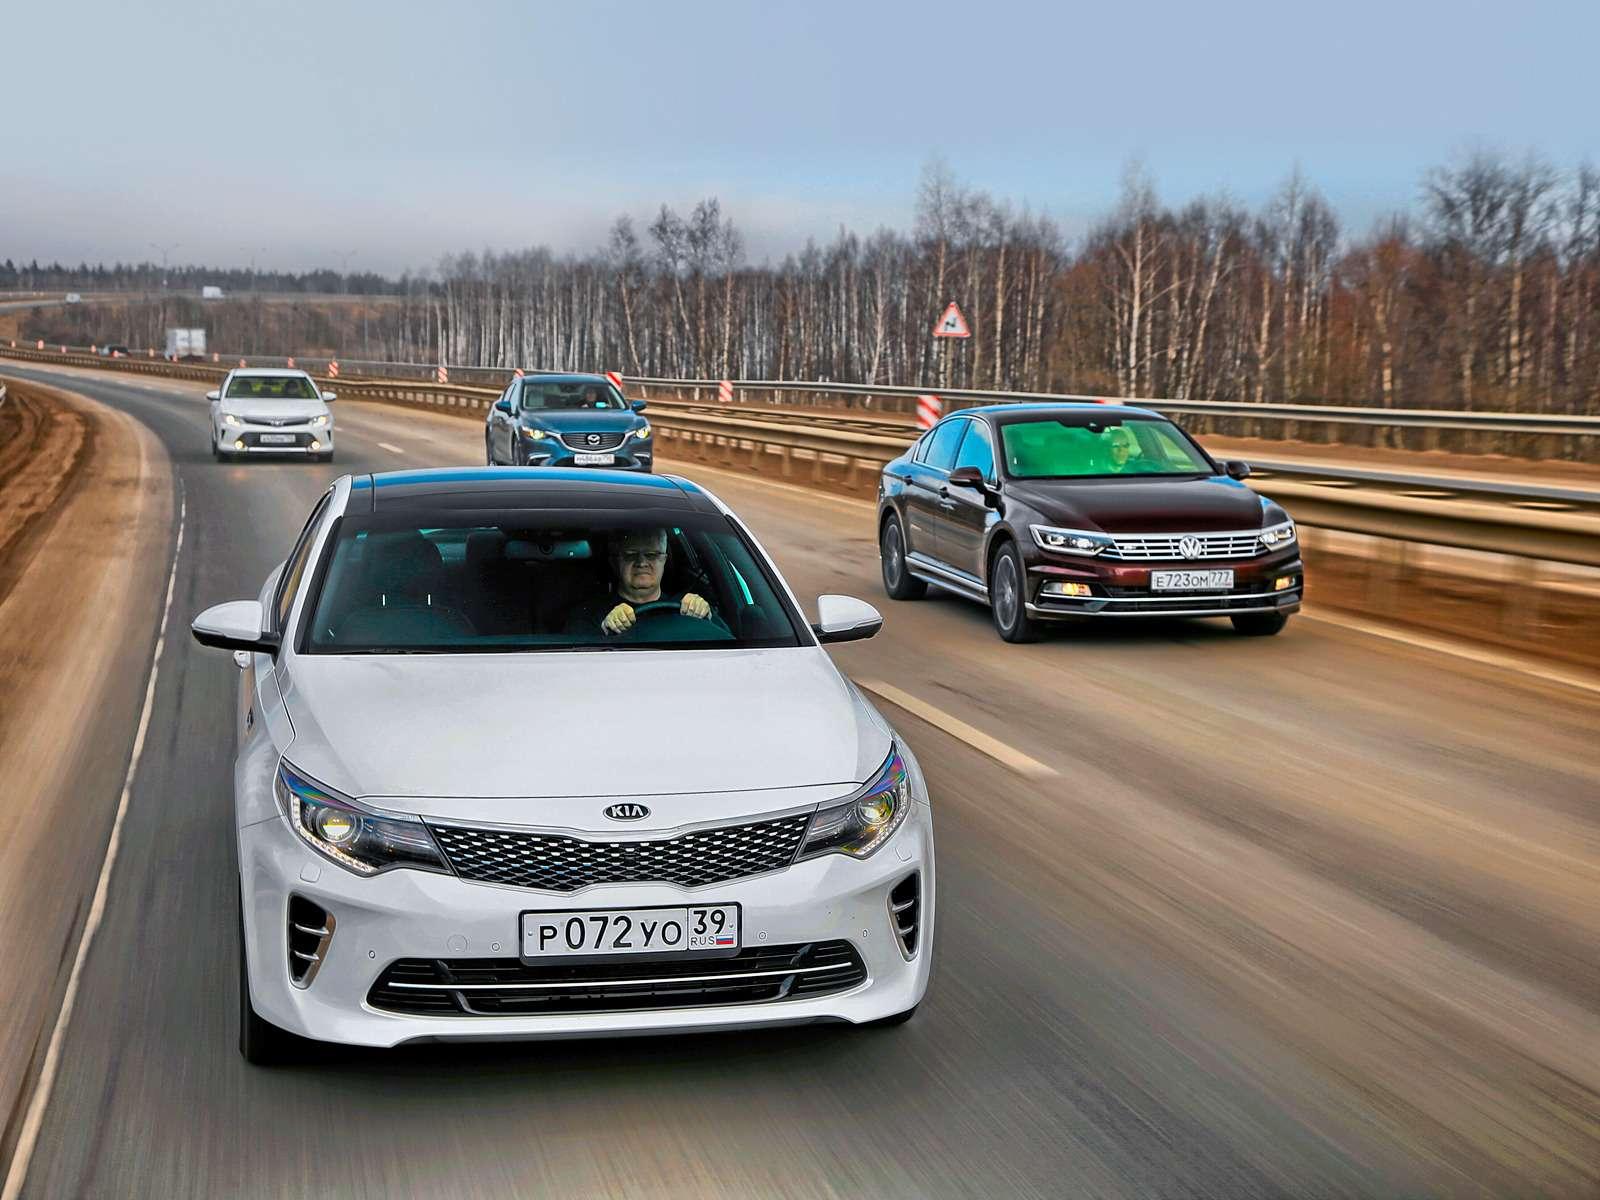 Супертест: новая Kia Optima против трех конкурентов— фото 596189